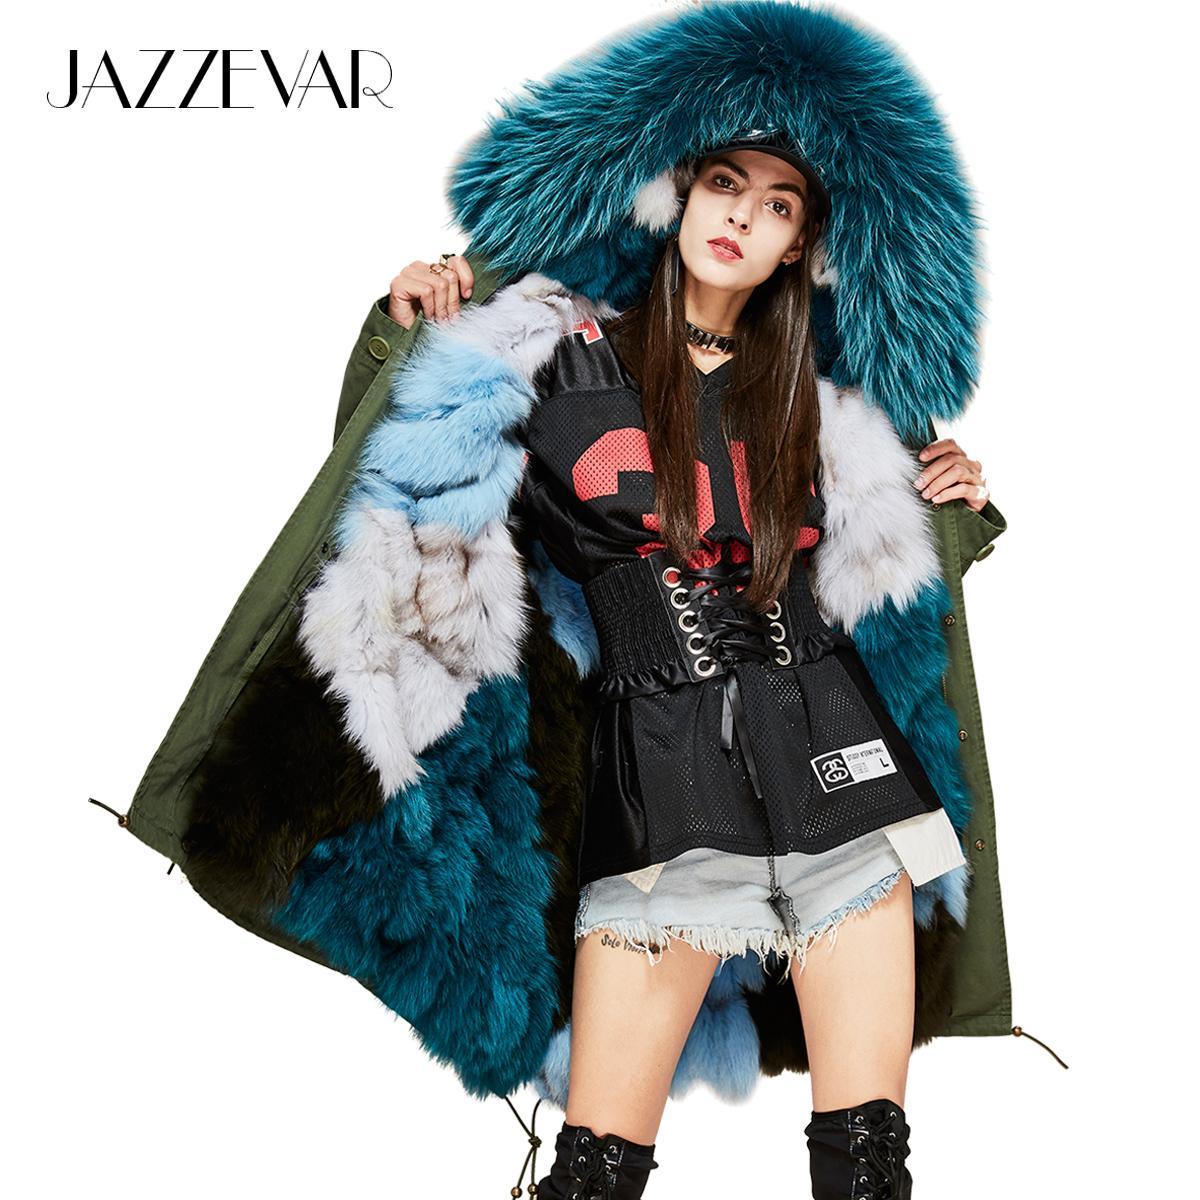 922d7e701 JAZZEVAR New Fashion Woman Luxurious Real Fox fur lining Military Parka  MIDI Large Raccoon fur Hooded Coat Outwear Winter Jacket S930